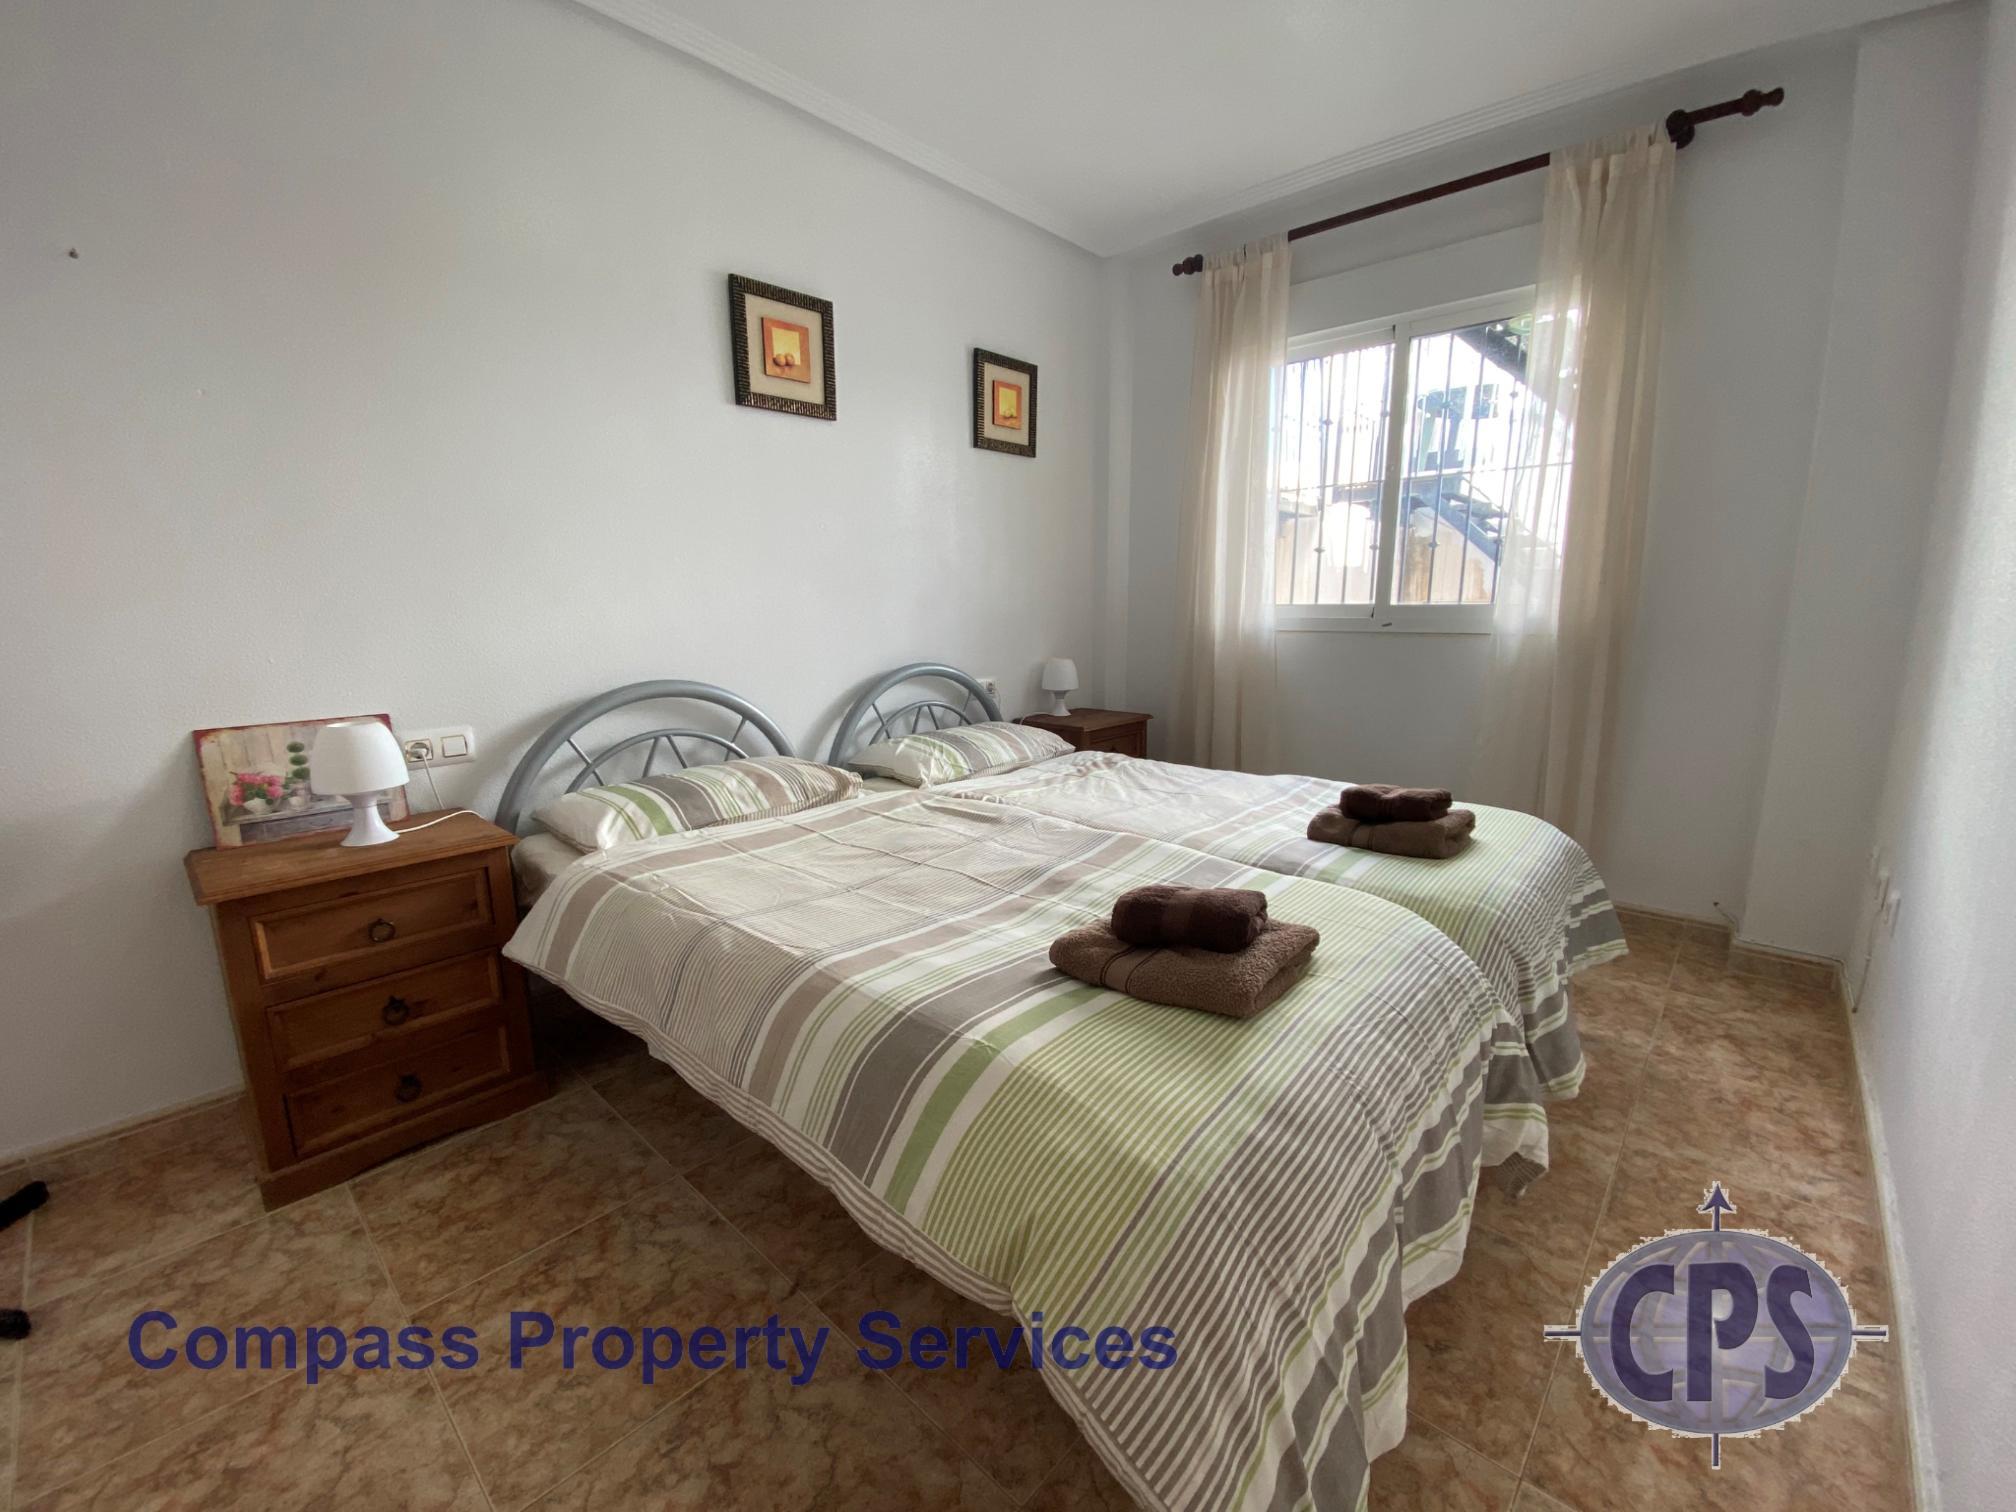 Apartment La Cinuelica R3 1st flr apt overlooking pool l149 photo 28556778